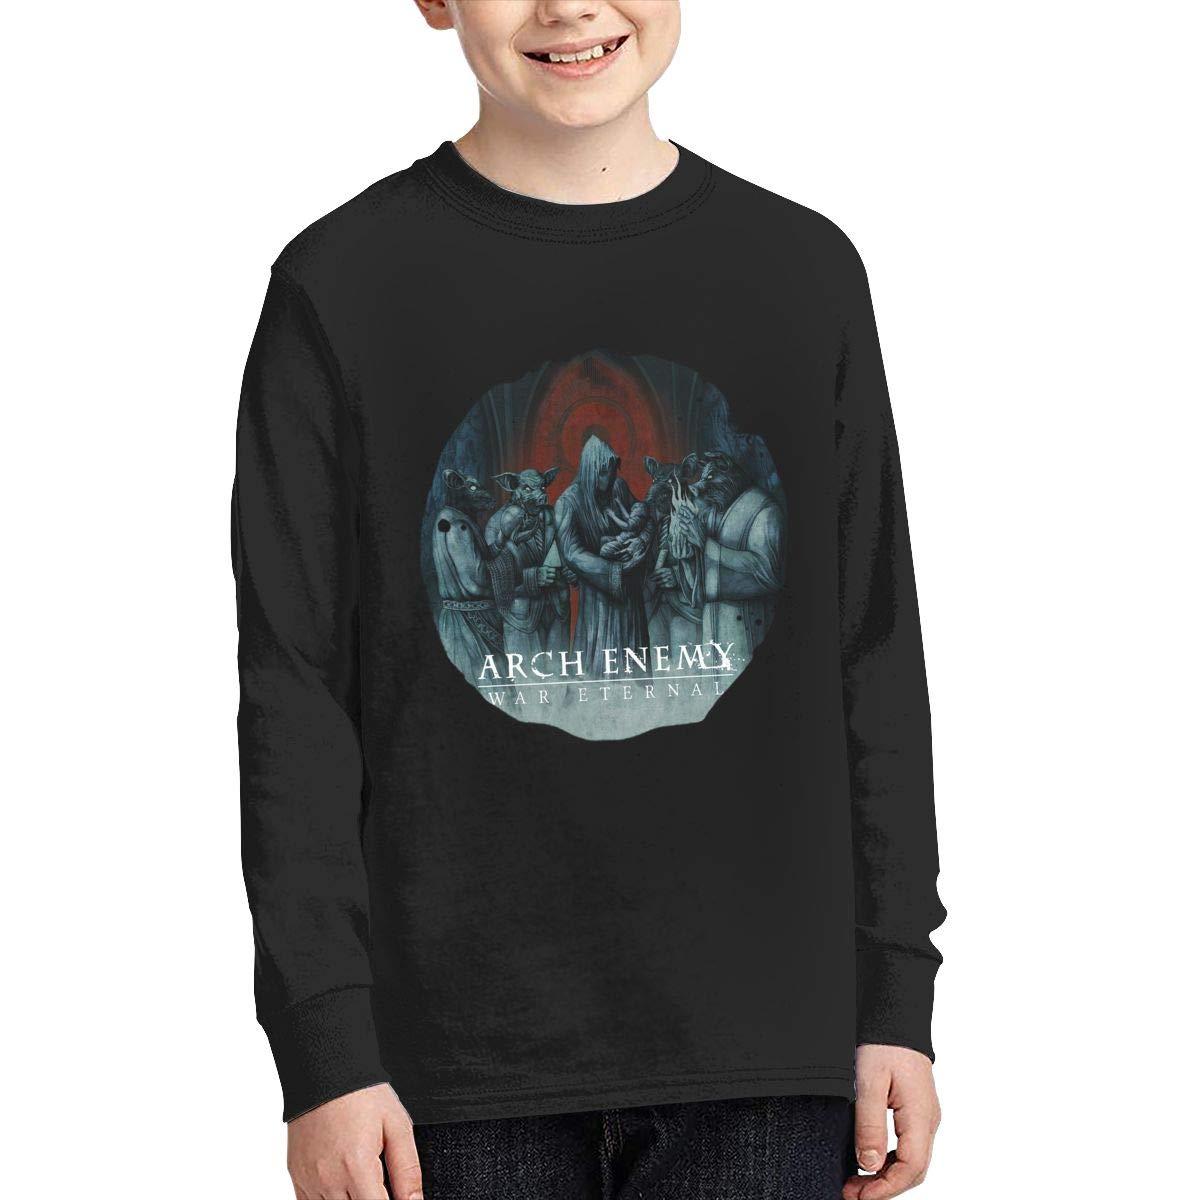 Landonaserafin Teens Arch Enemy Hip Hop Girls T Shirt 6678